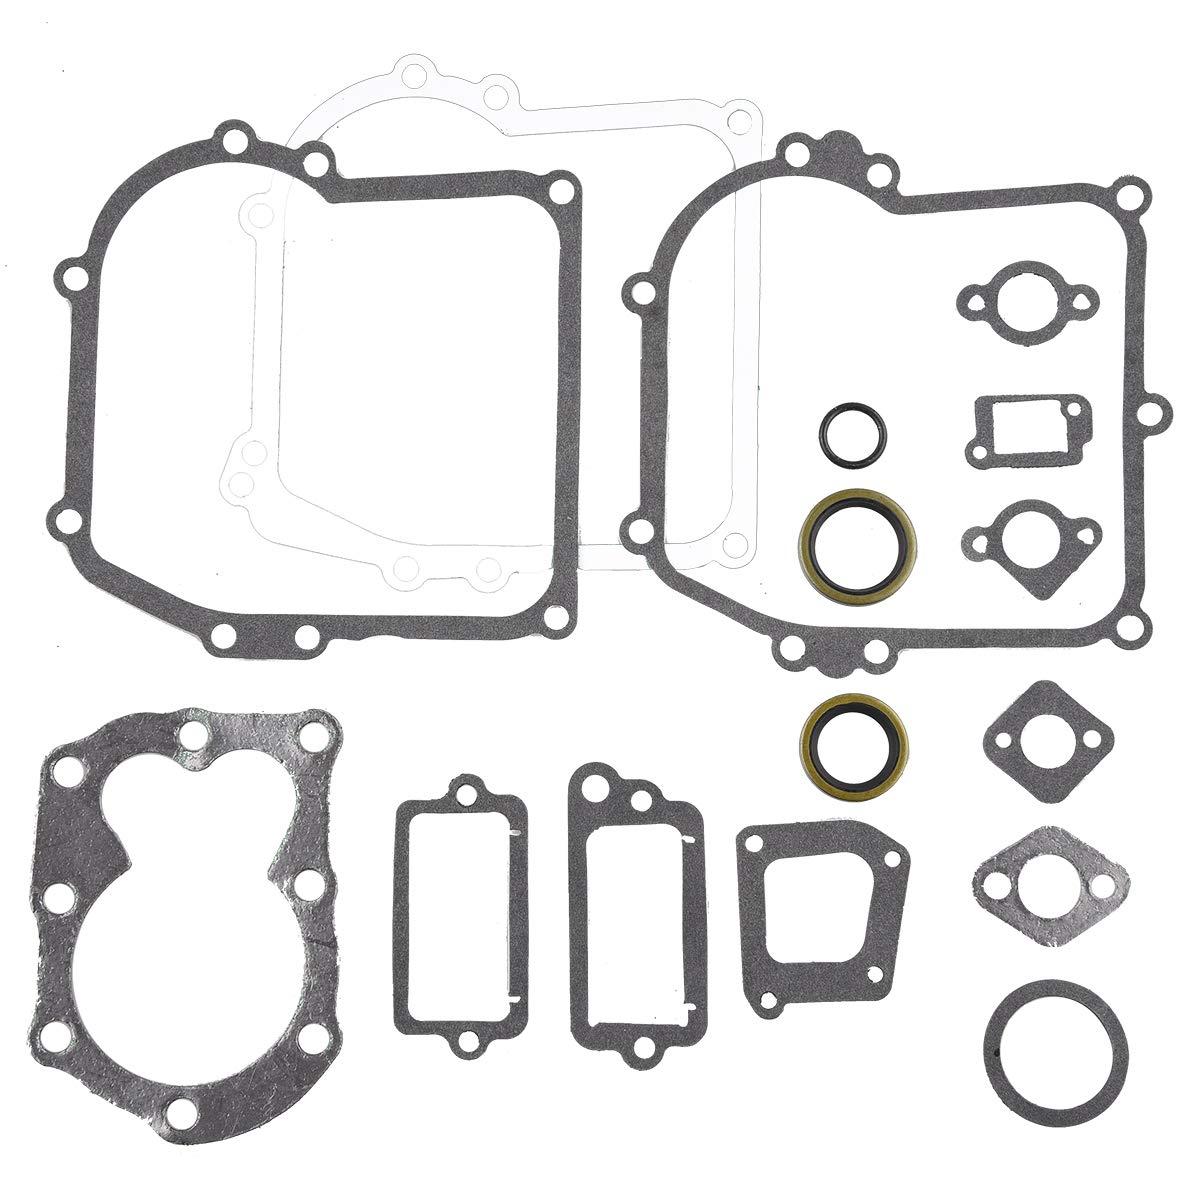 PRO CAKEN 590777 Engine de Joints Remplace 794209, 699933, 298989 Briggs & Stratton Dirtbikeclub